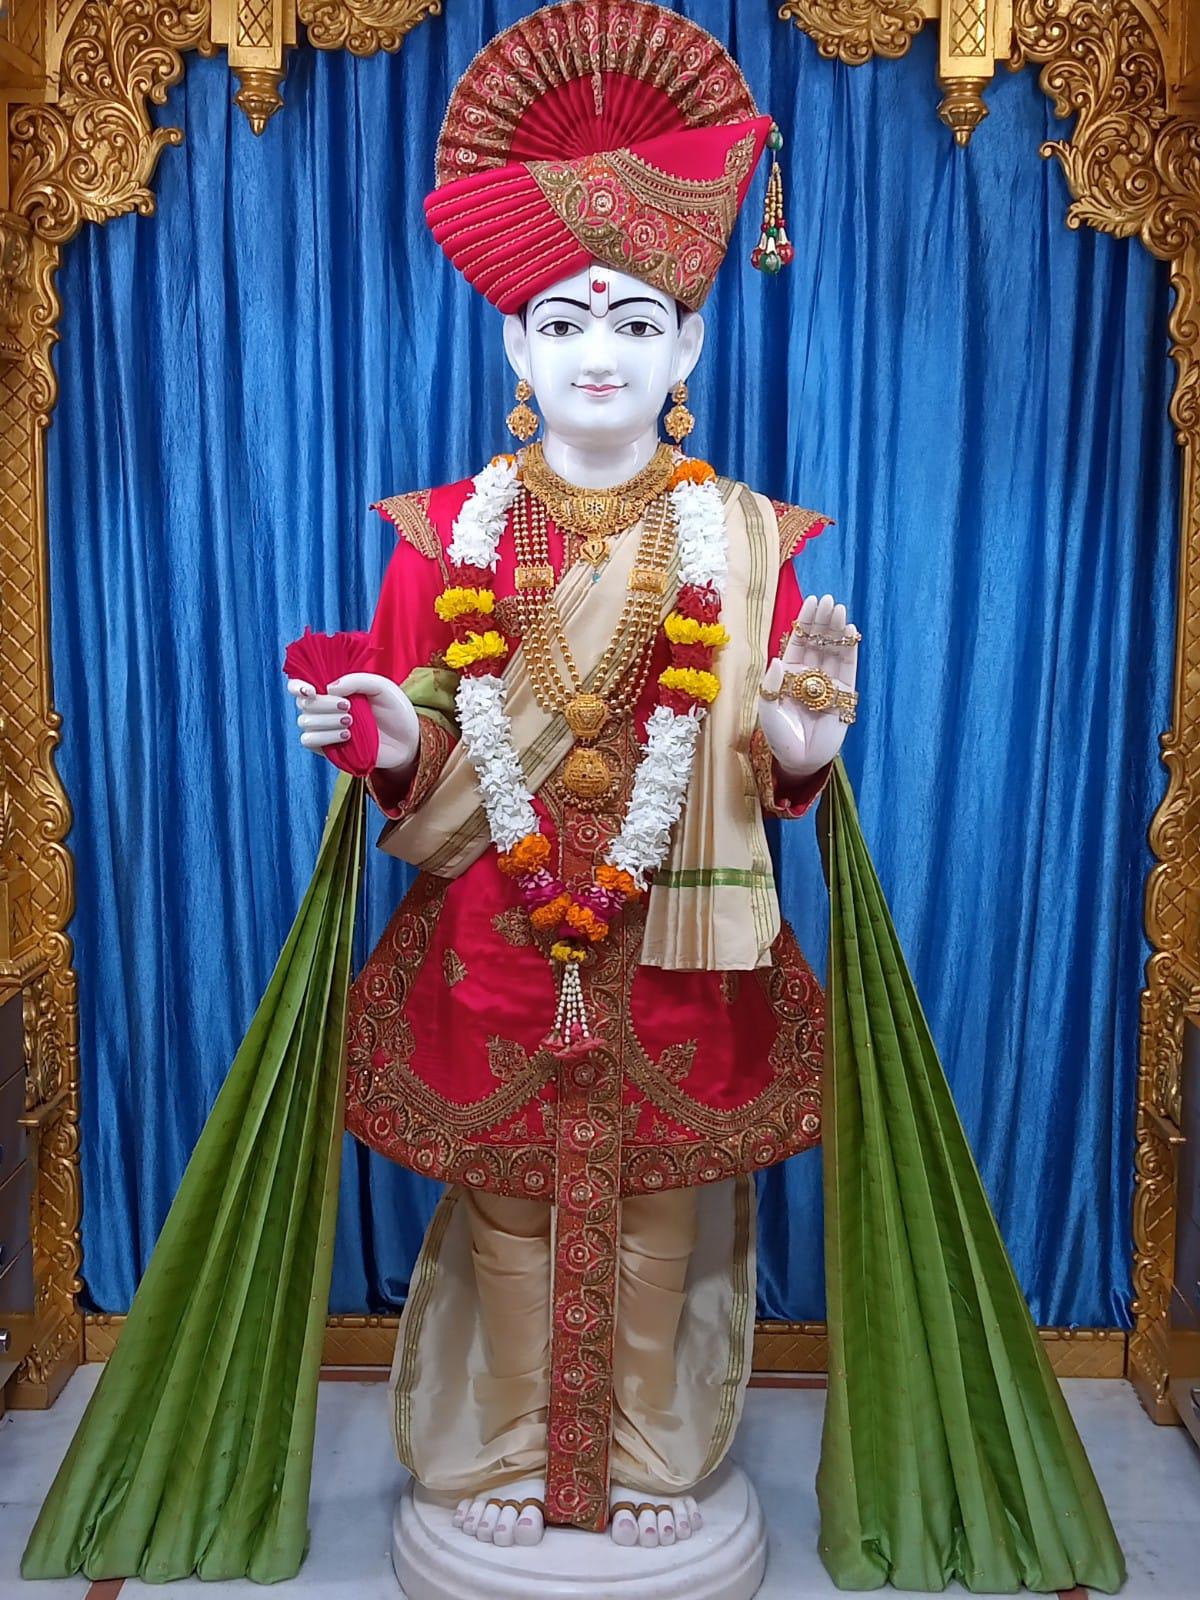 SMVS Swaminarayan Mandir - Mehsana